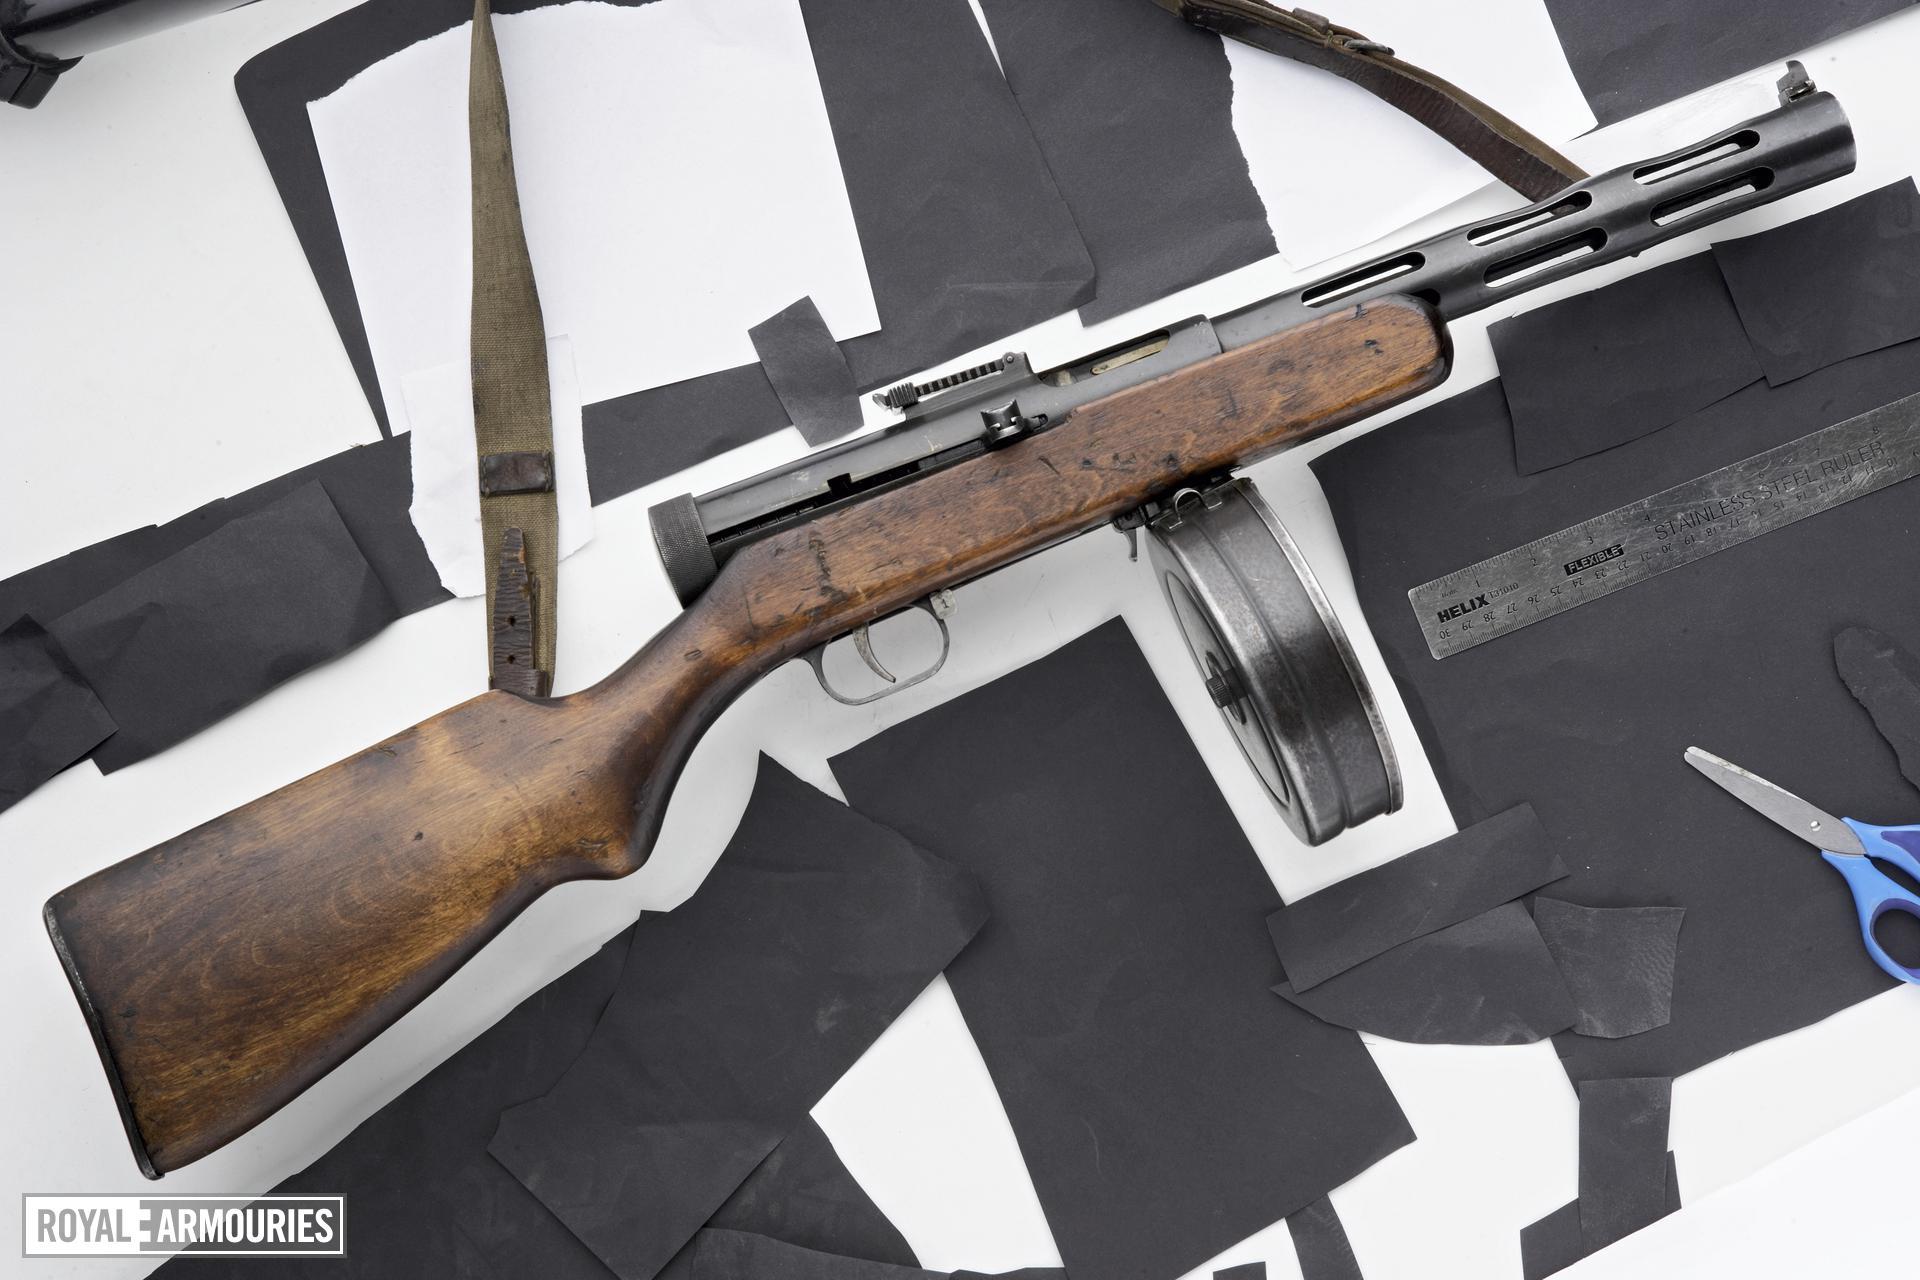 Centrefire automatic submachine gun - Degtyarev PPD 34/38